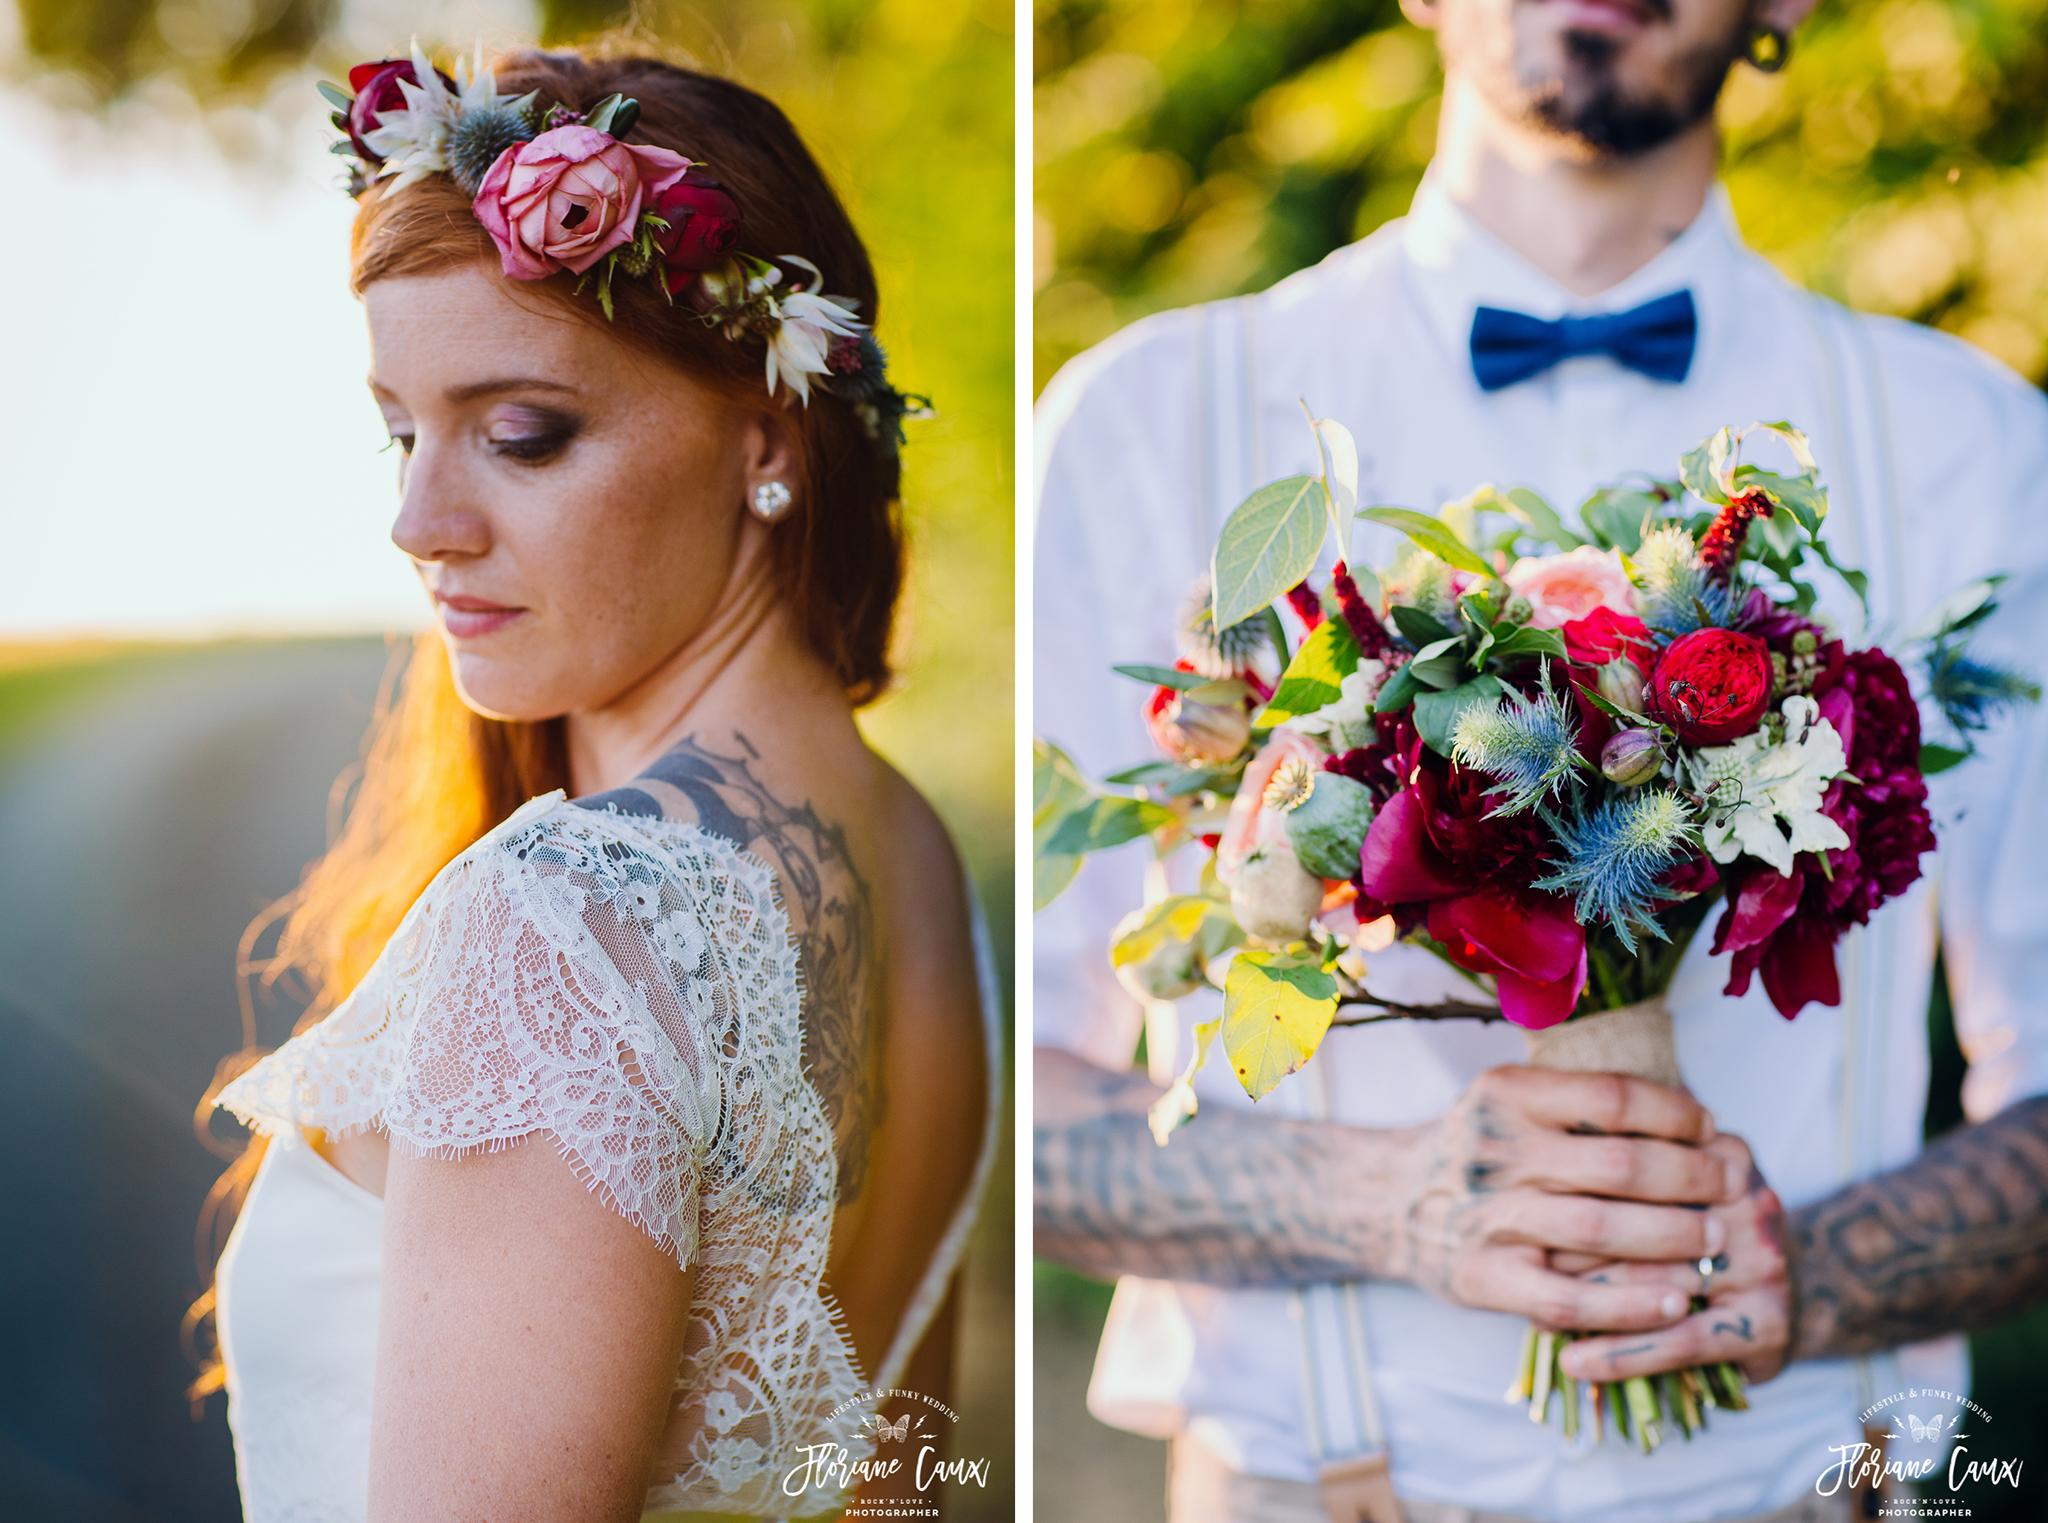 photographe-mariage-toulouse-rocknroll-maries-tatoues-floriane-caux-78